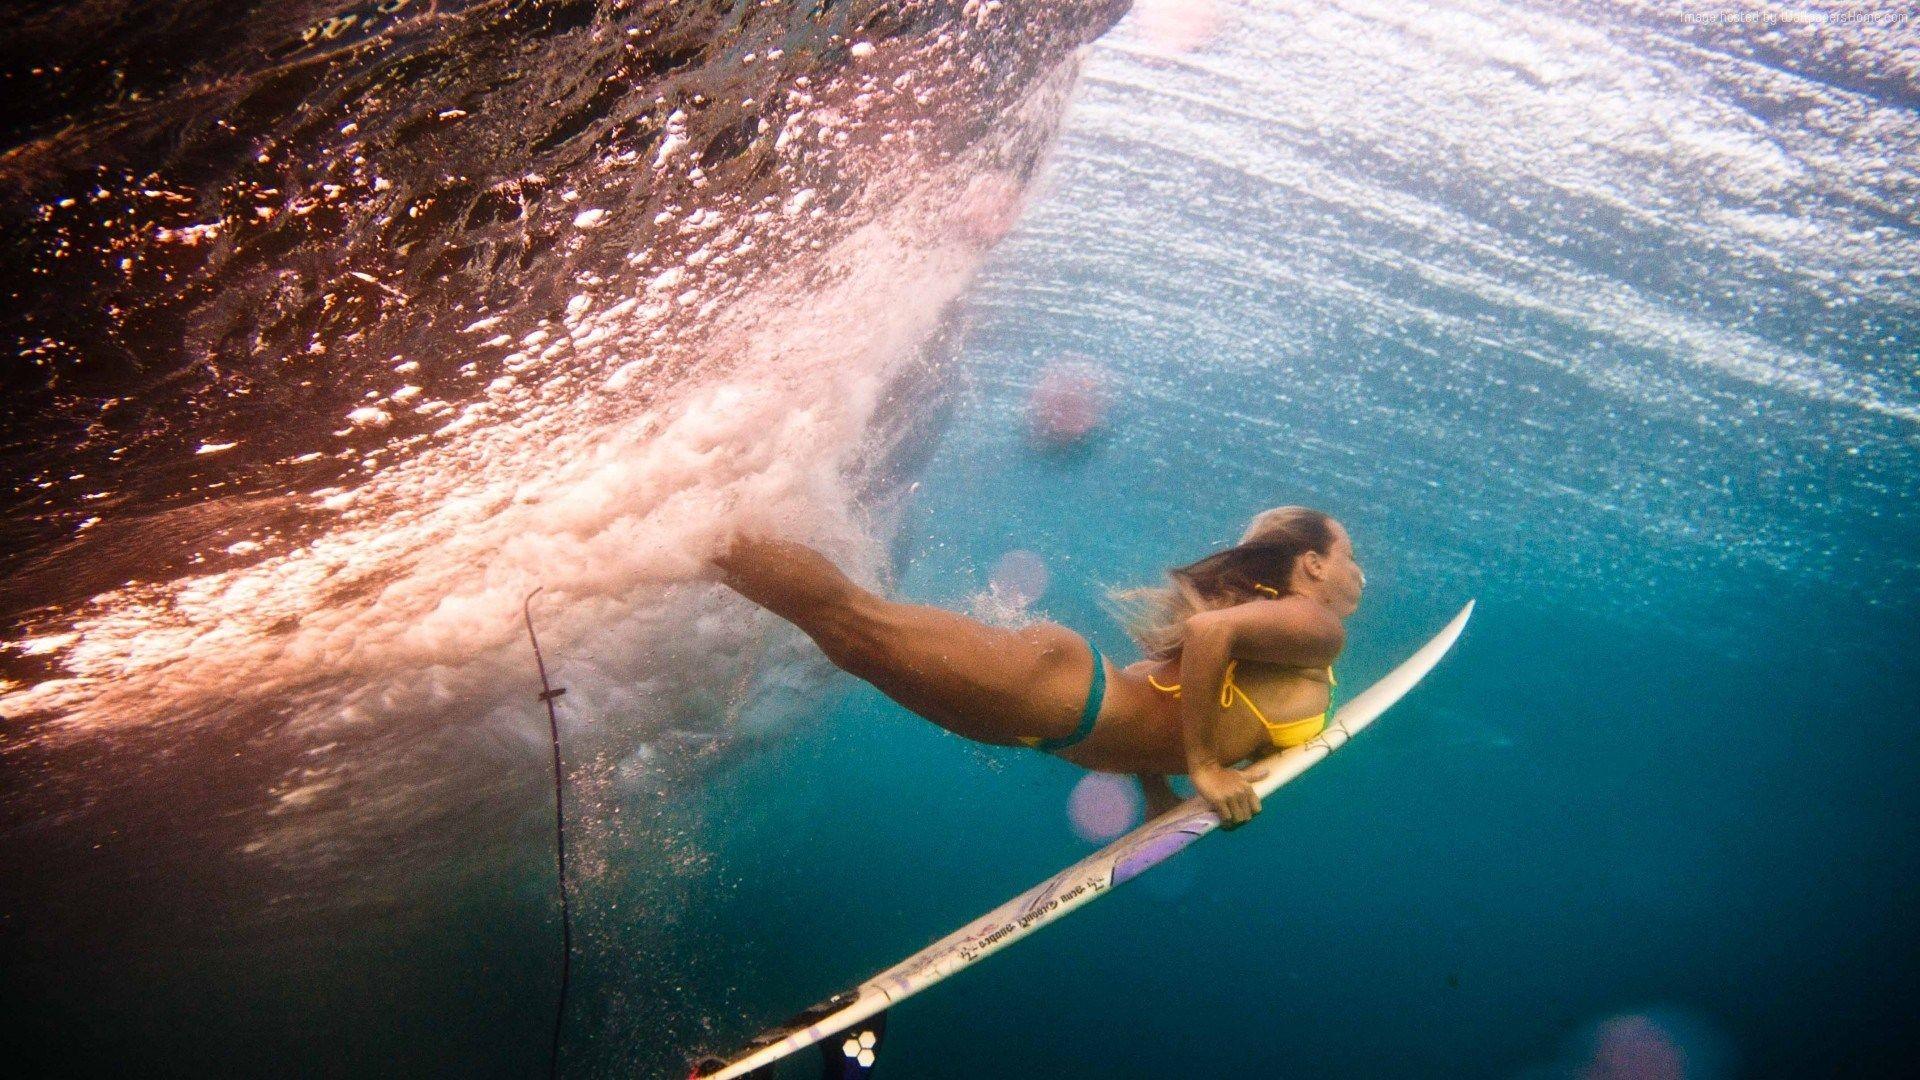 Res: 1920x1080, surfing wallpaper sport